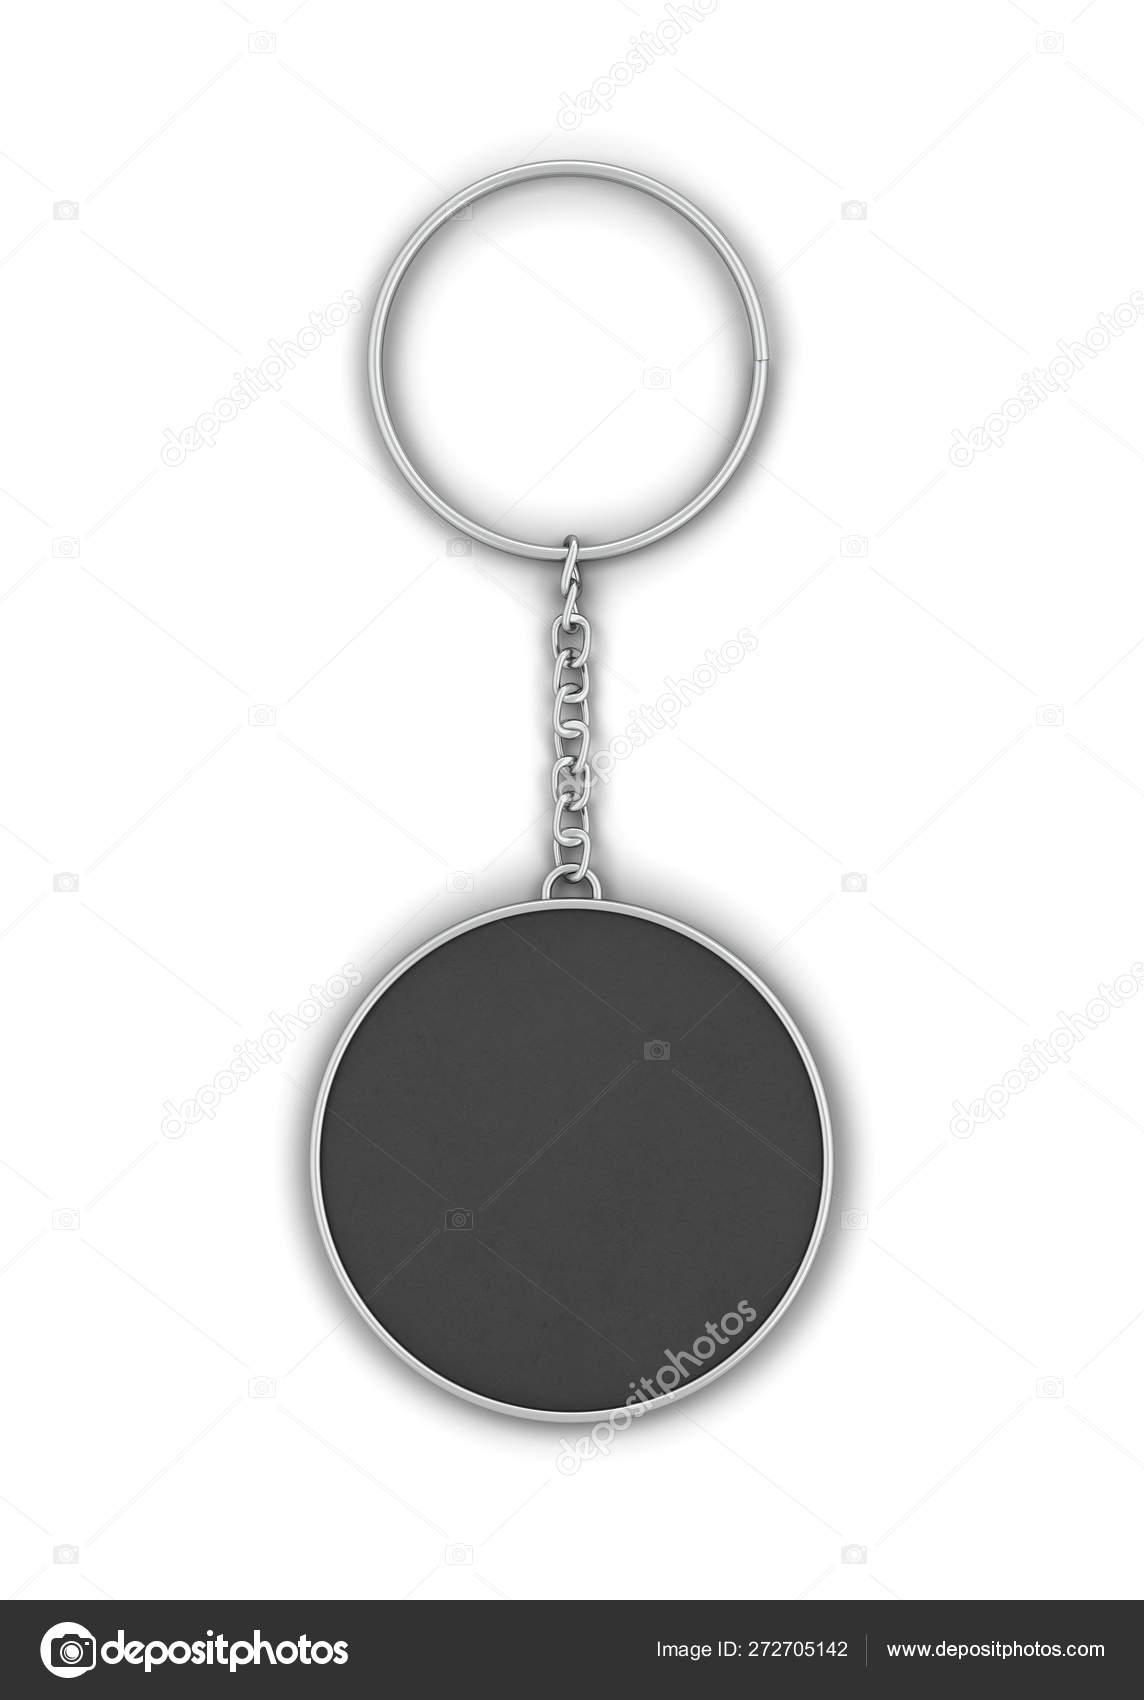 Gantungan Kunci Mockup : gantungan, kunci, mockup, Portofolio:, Montego, Halaman, Foto,, Ilustrasi, Vektor, Depositphotos®